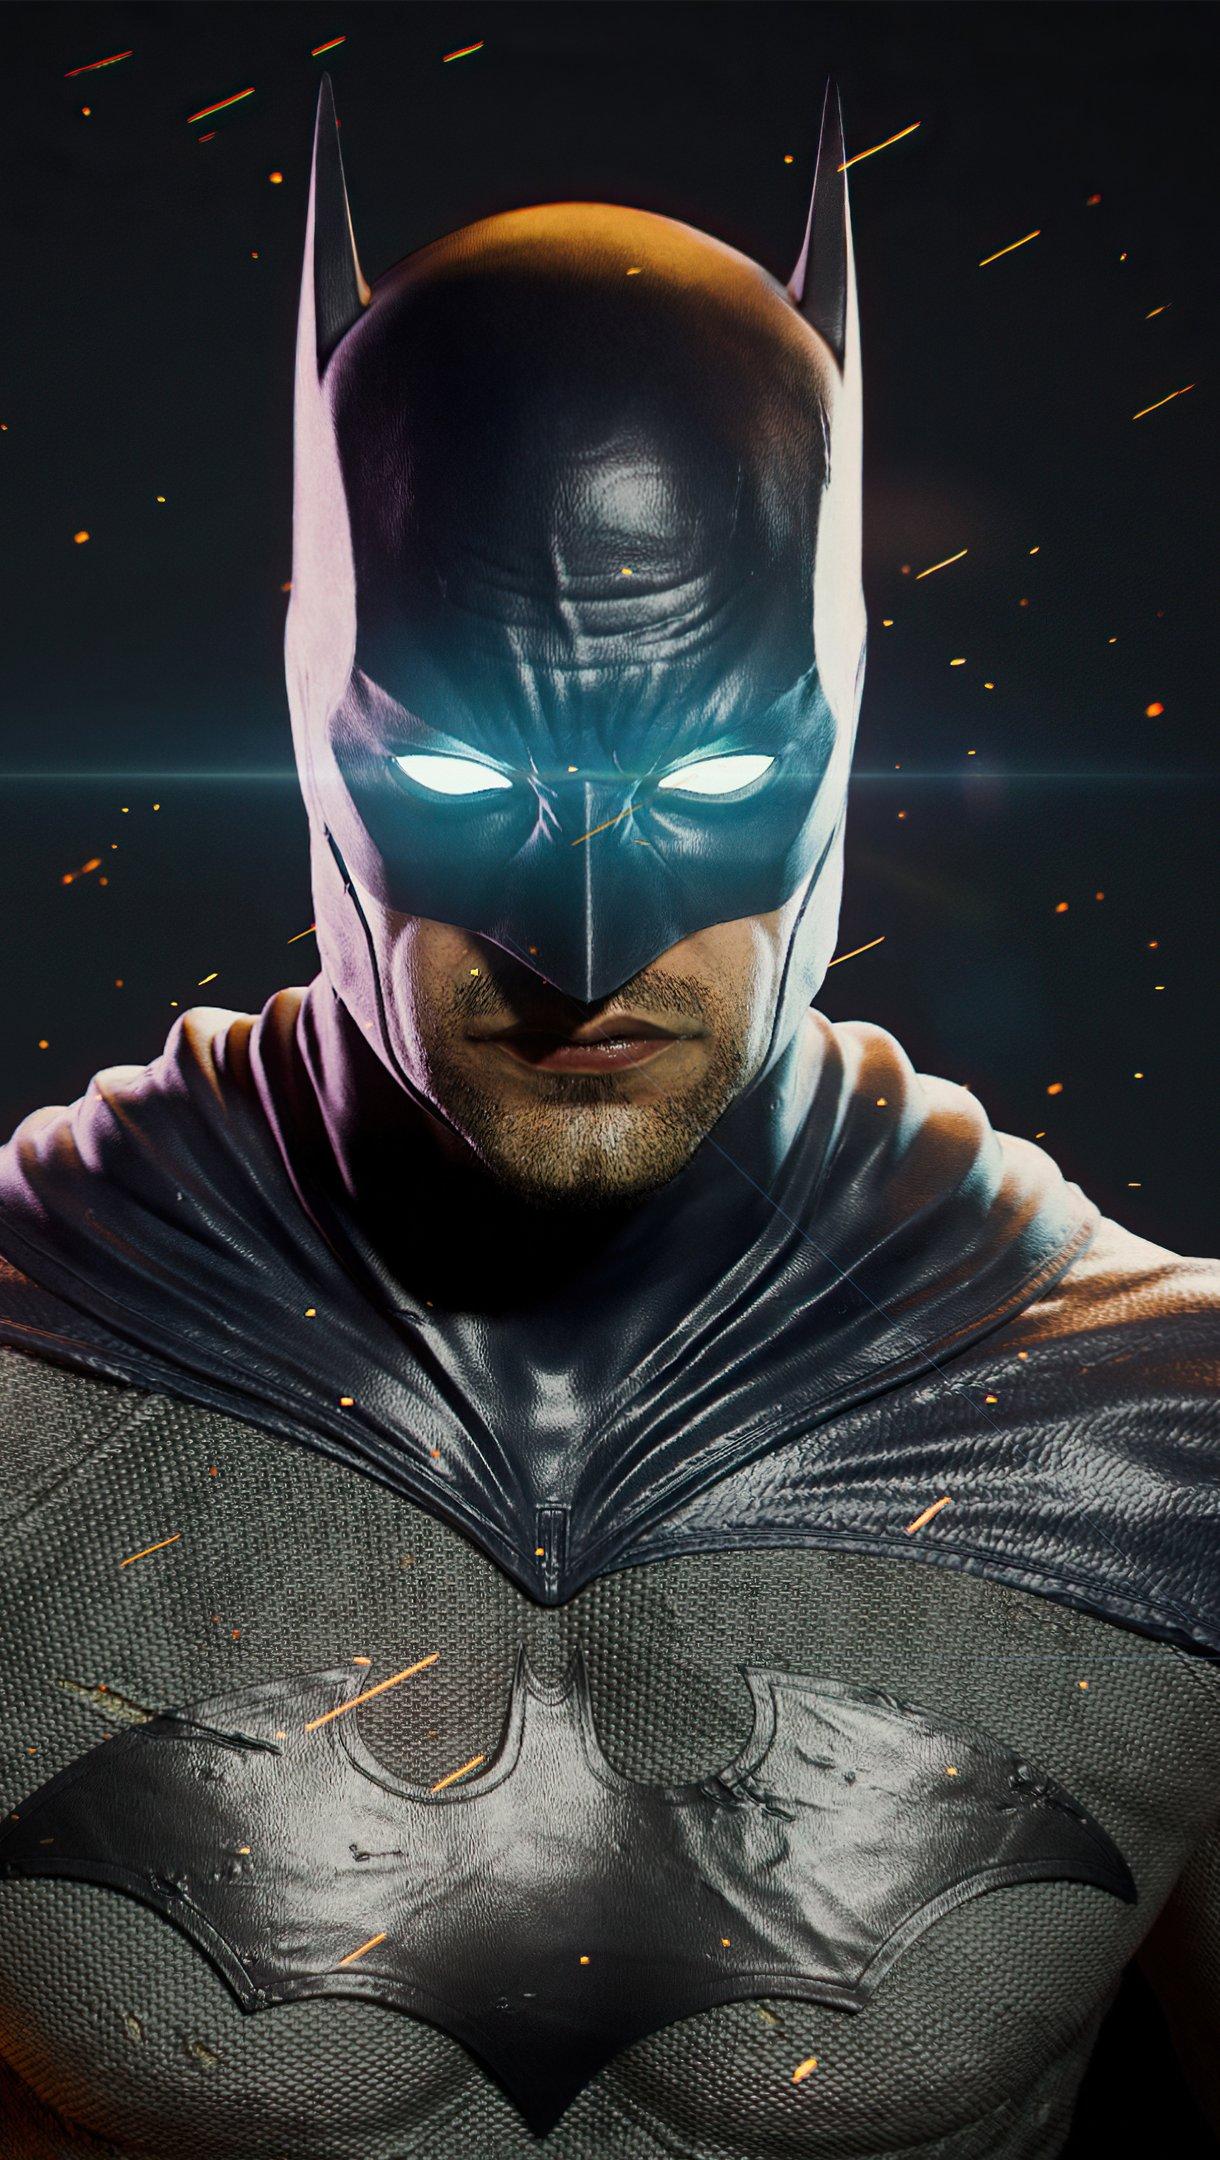 Wallpaper Batman glowing eyes Vertical